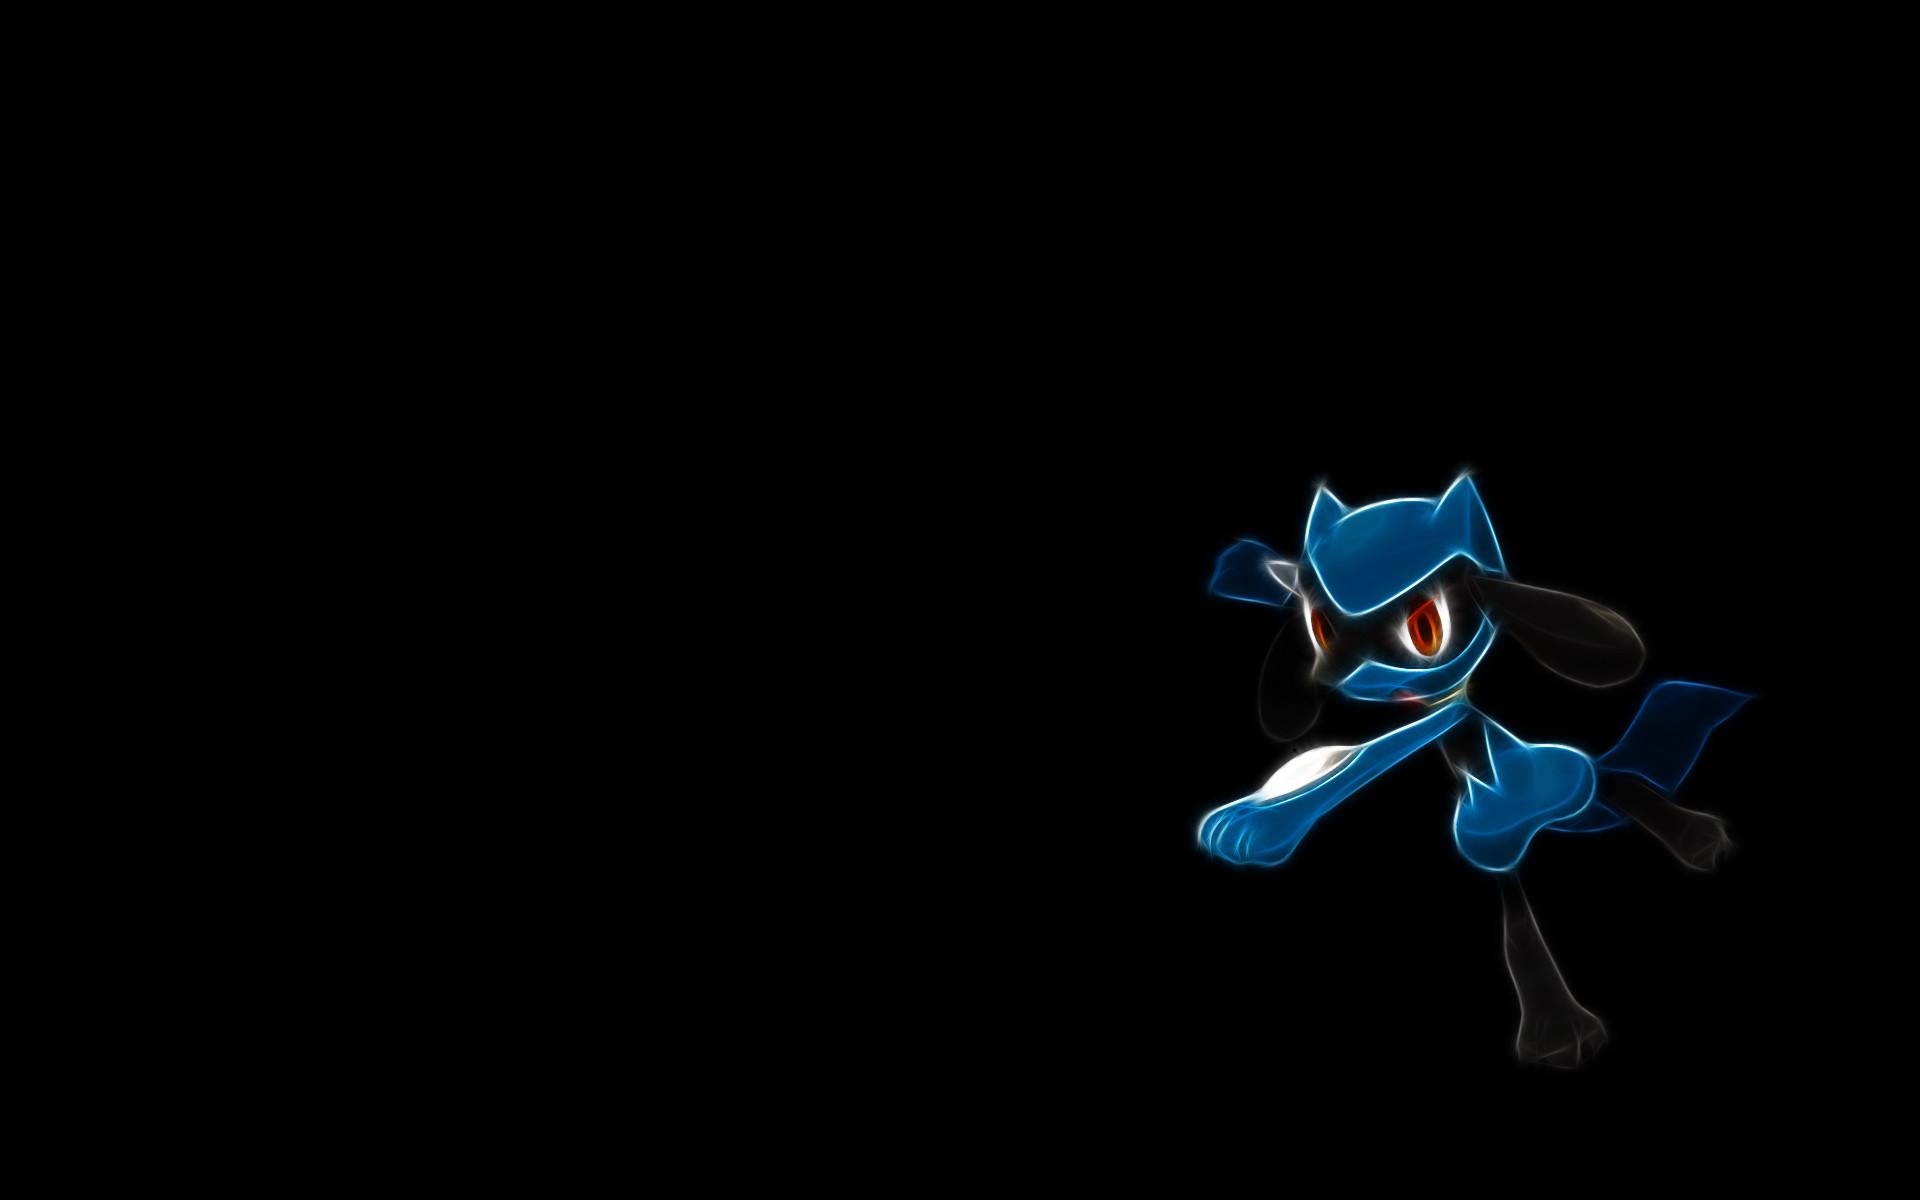 Pokemon Lucario Wallpaper 72 Images